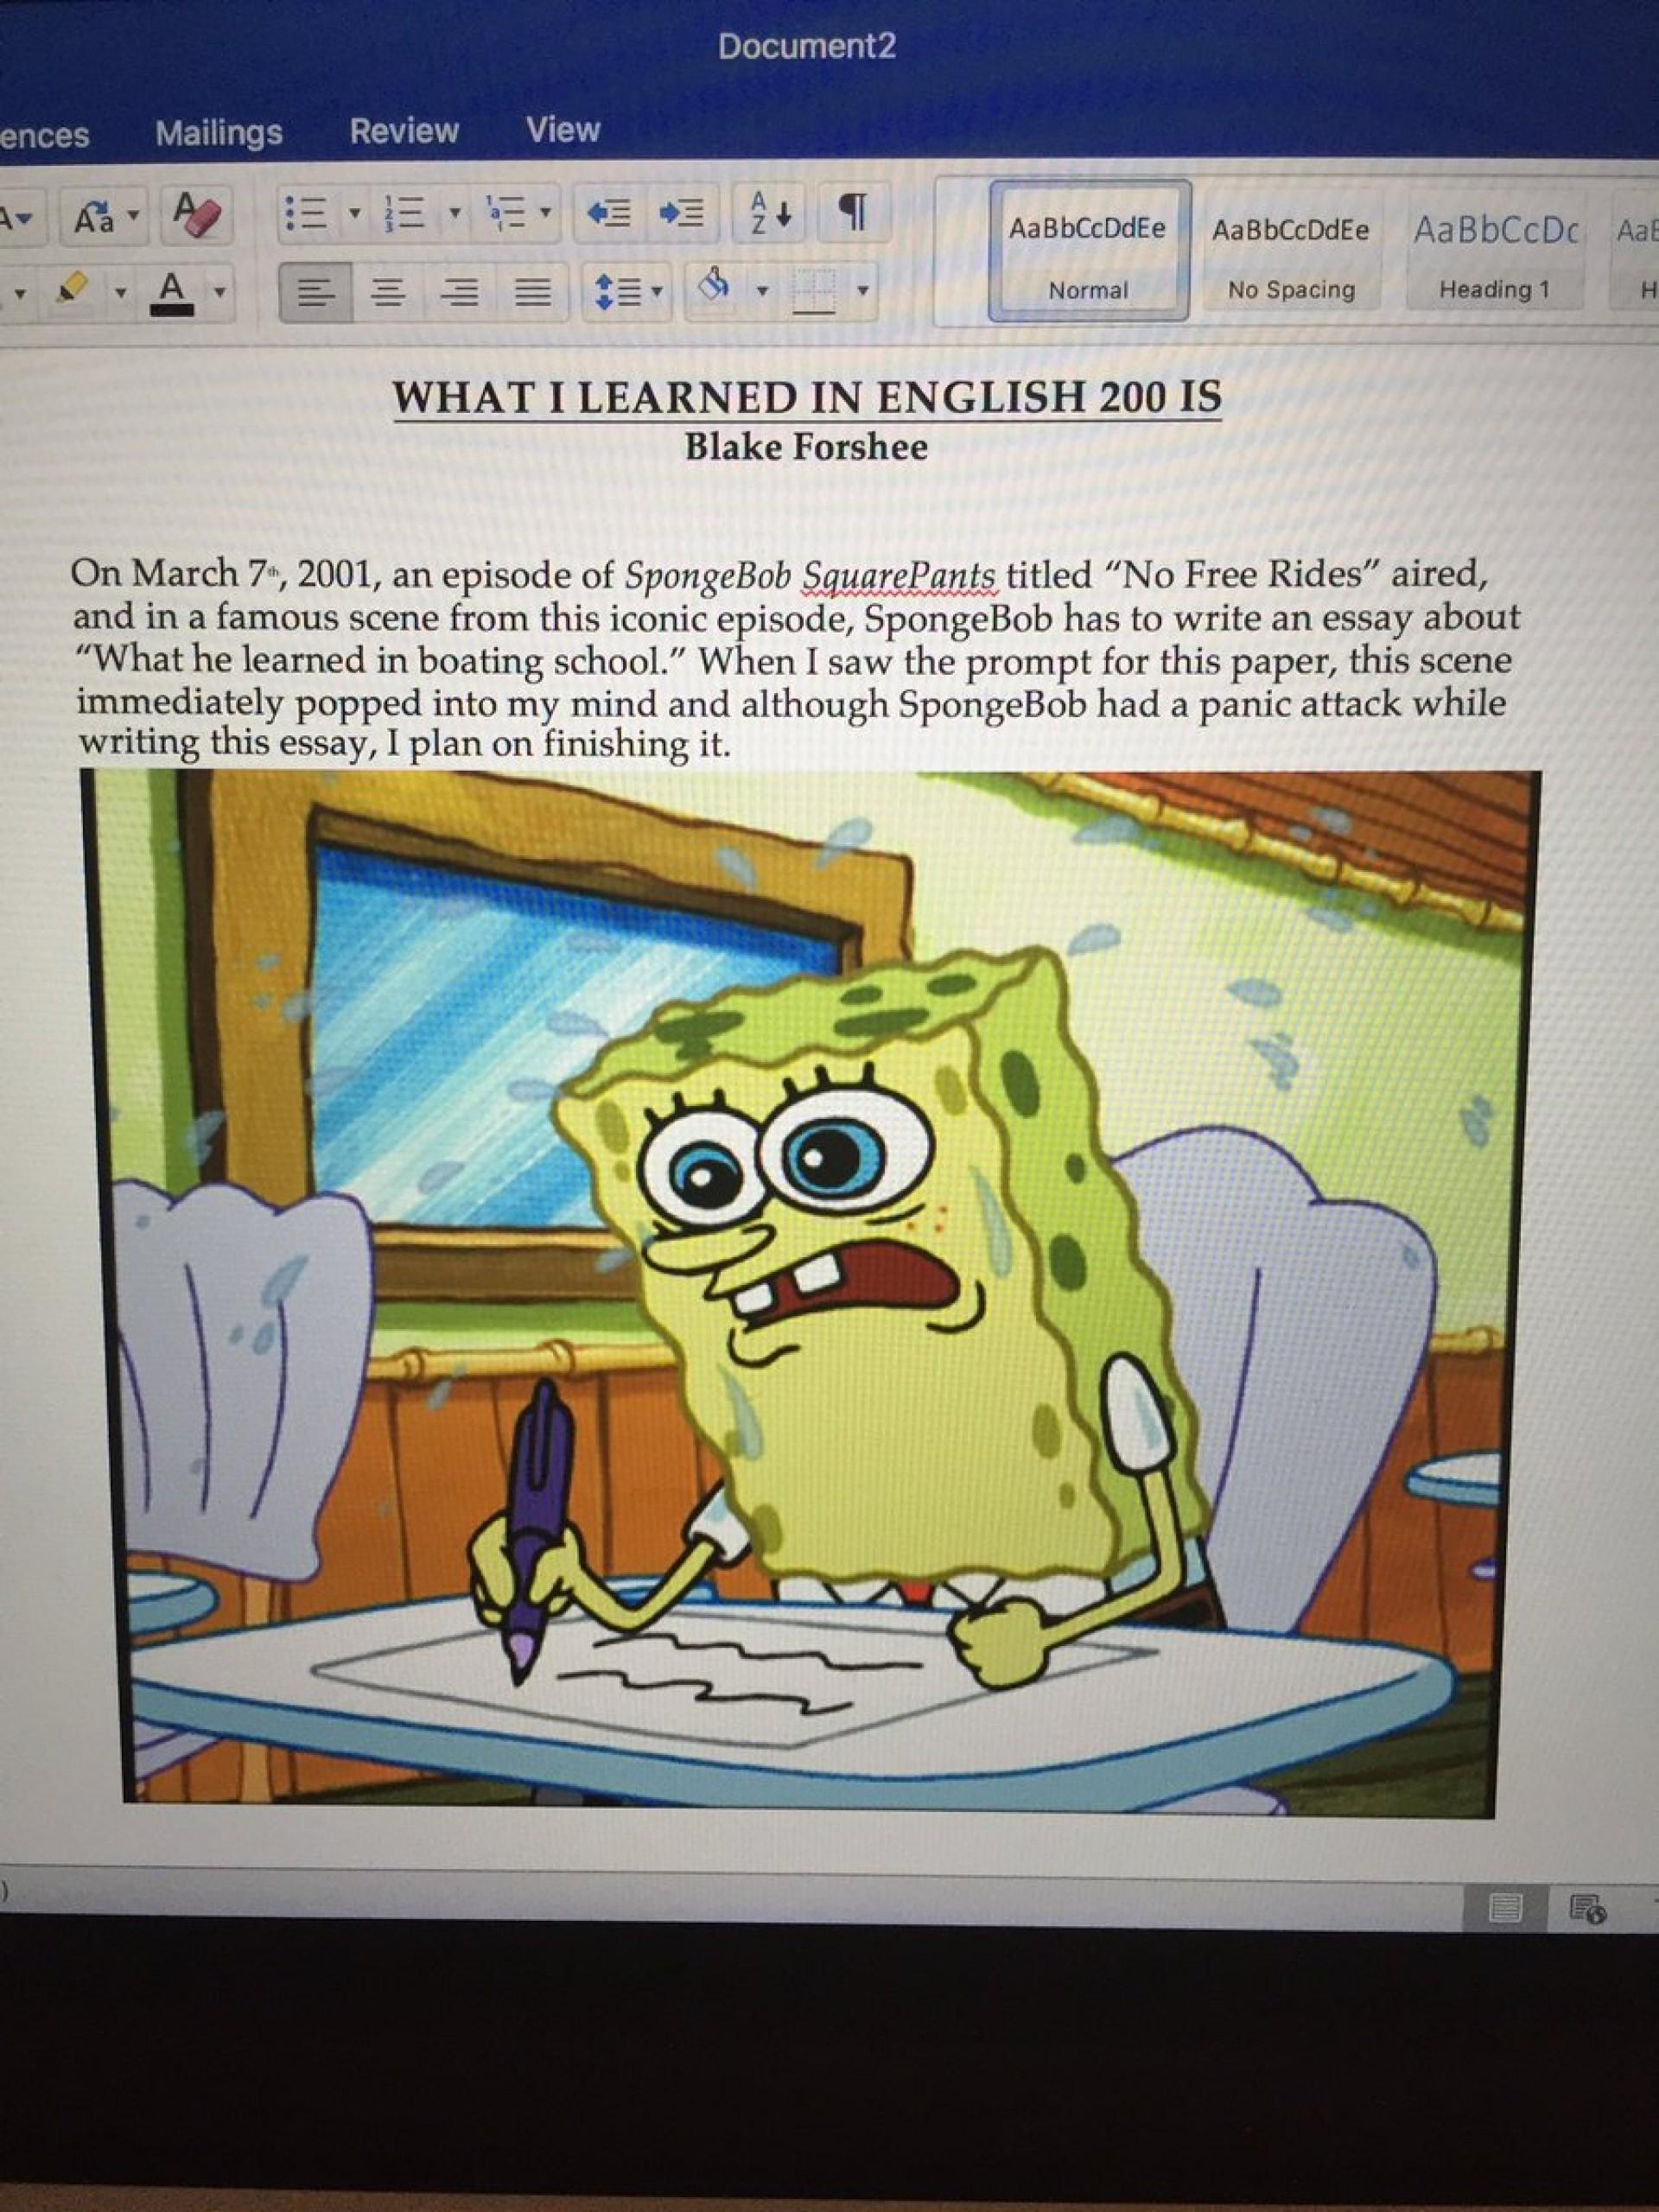 005 Essay Example Ben Smith Bensmith 15 Twitter Spongebob Episode Writing Cy9yjtixga Stirring Meme Font Generator 1920